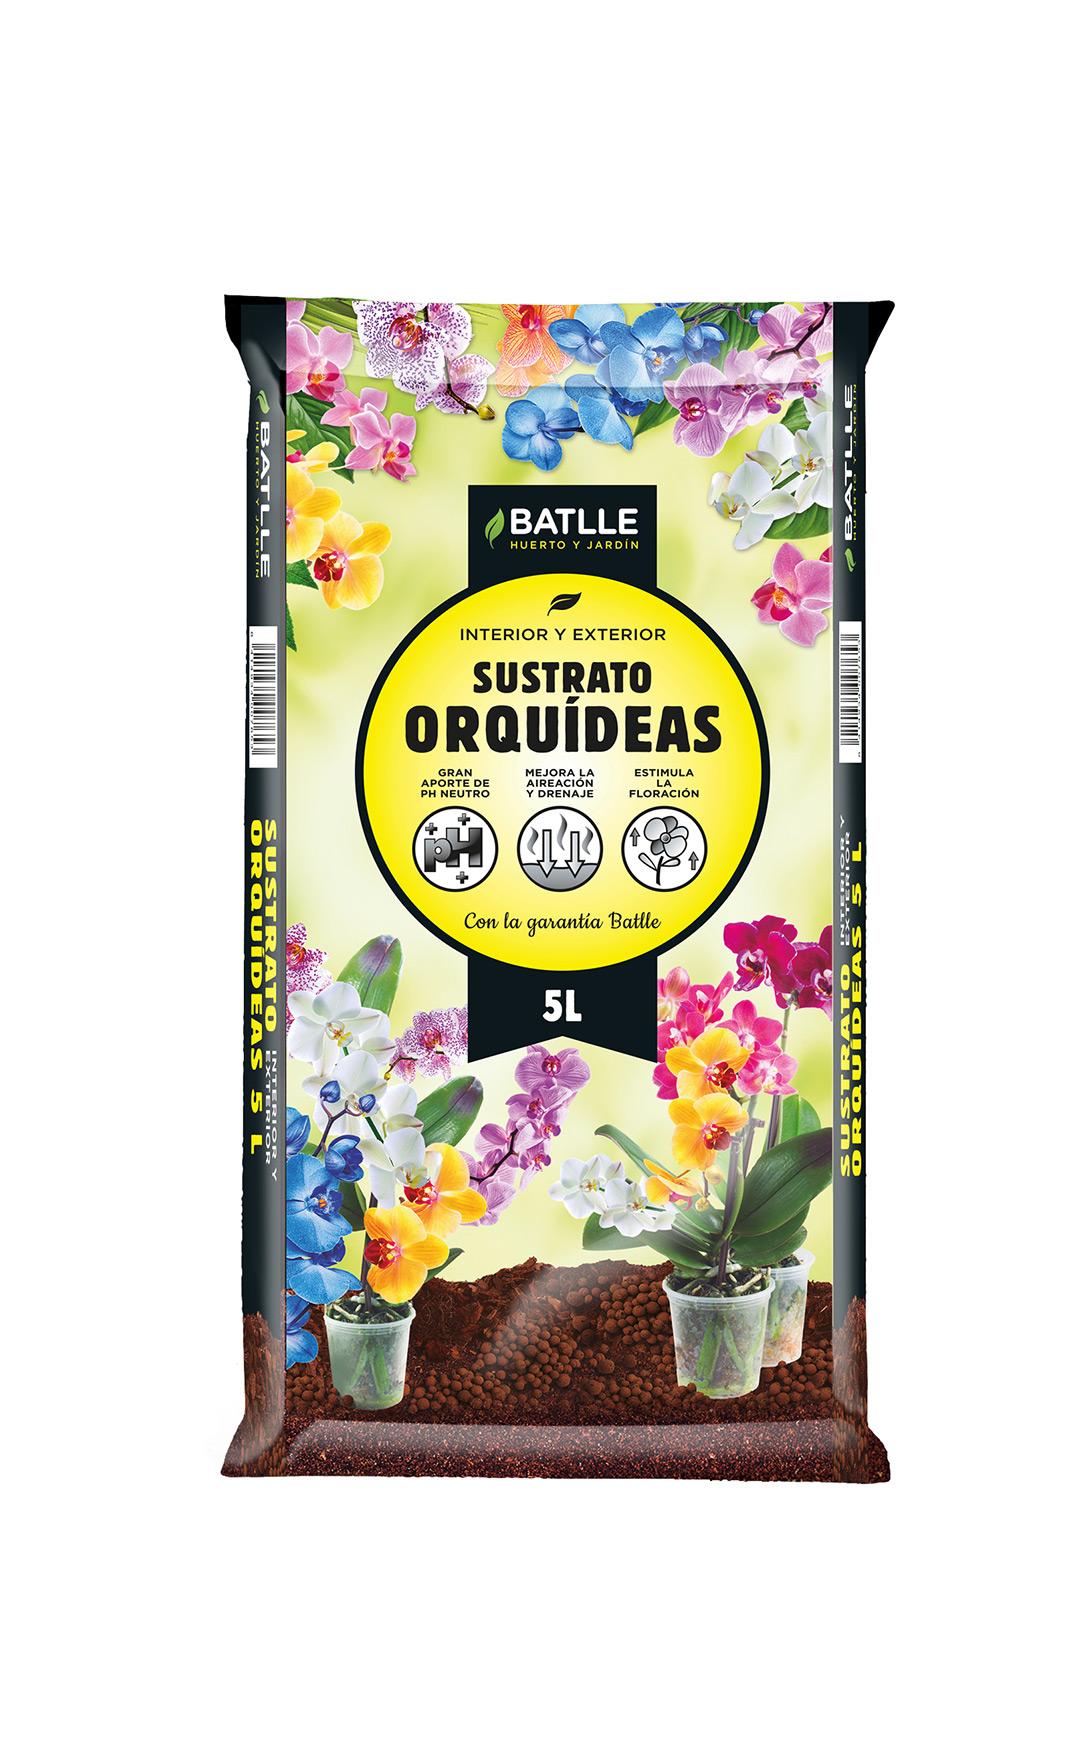 Substrato Orquídeas 5L